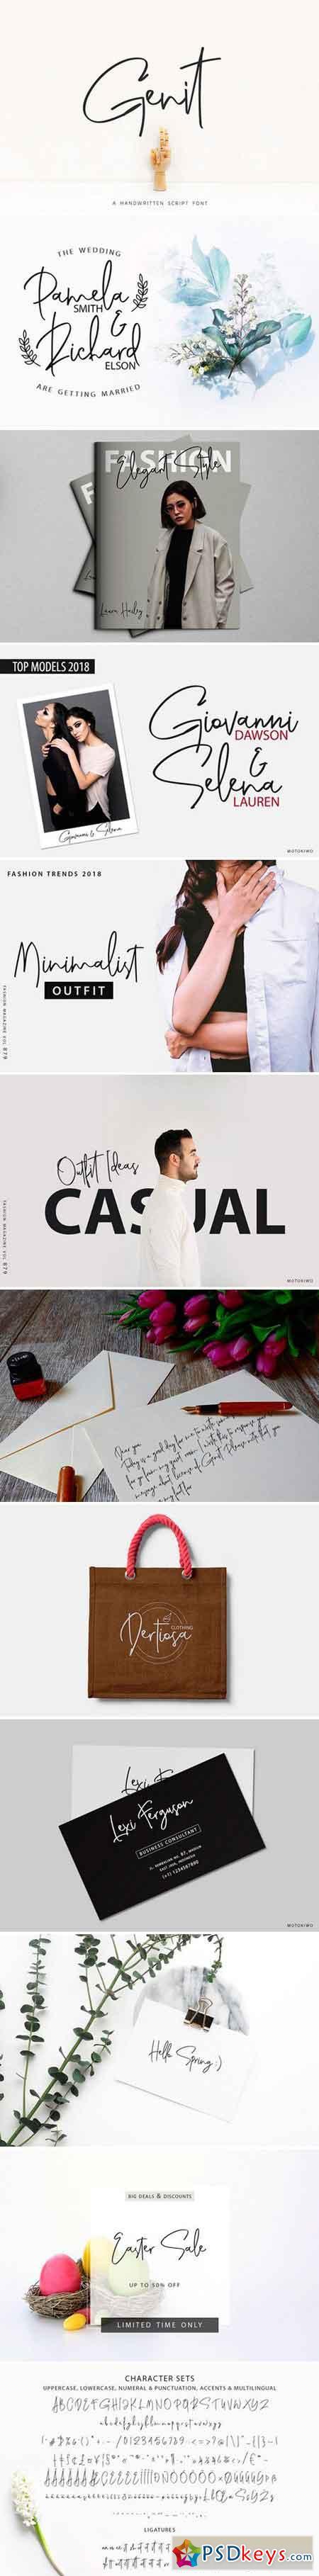 Genit - Classy Handwritten Font 2517925